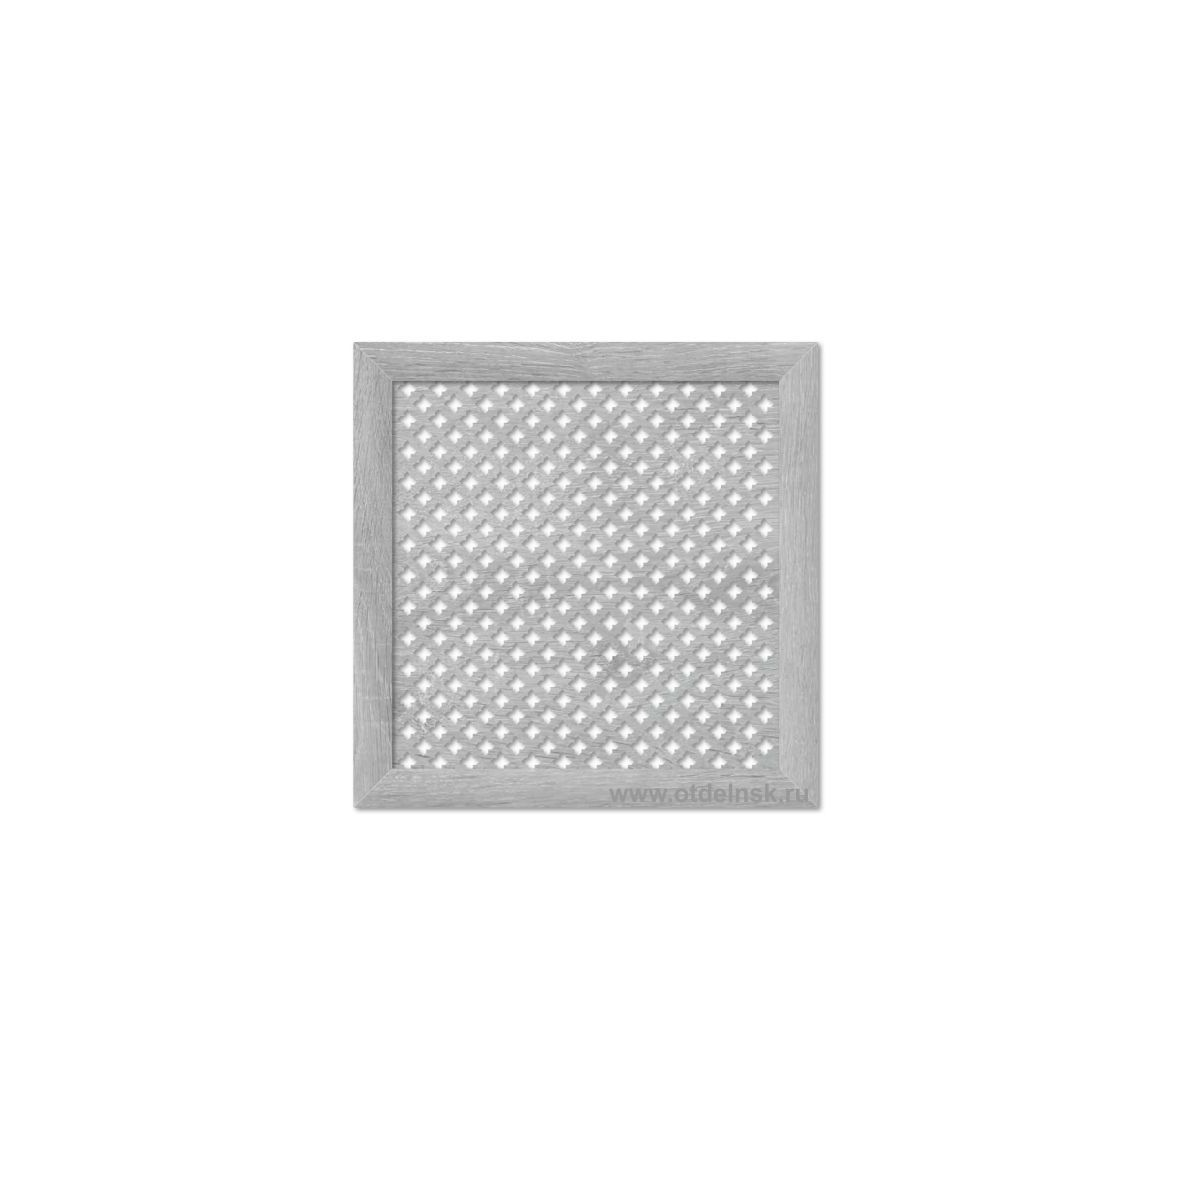 Дамаско Дуб серый 600х600 мм. Экран для радиаторов